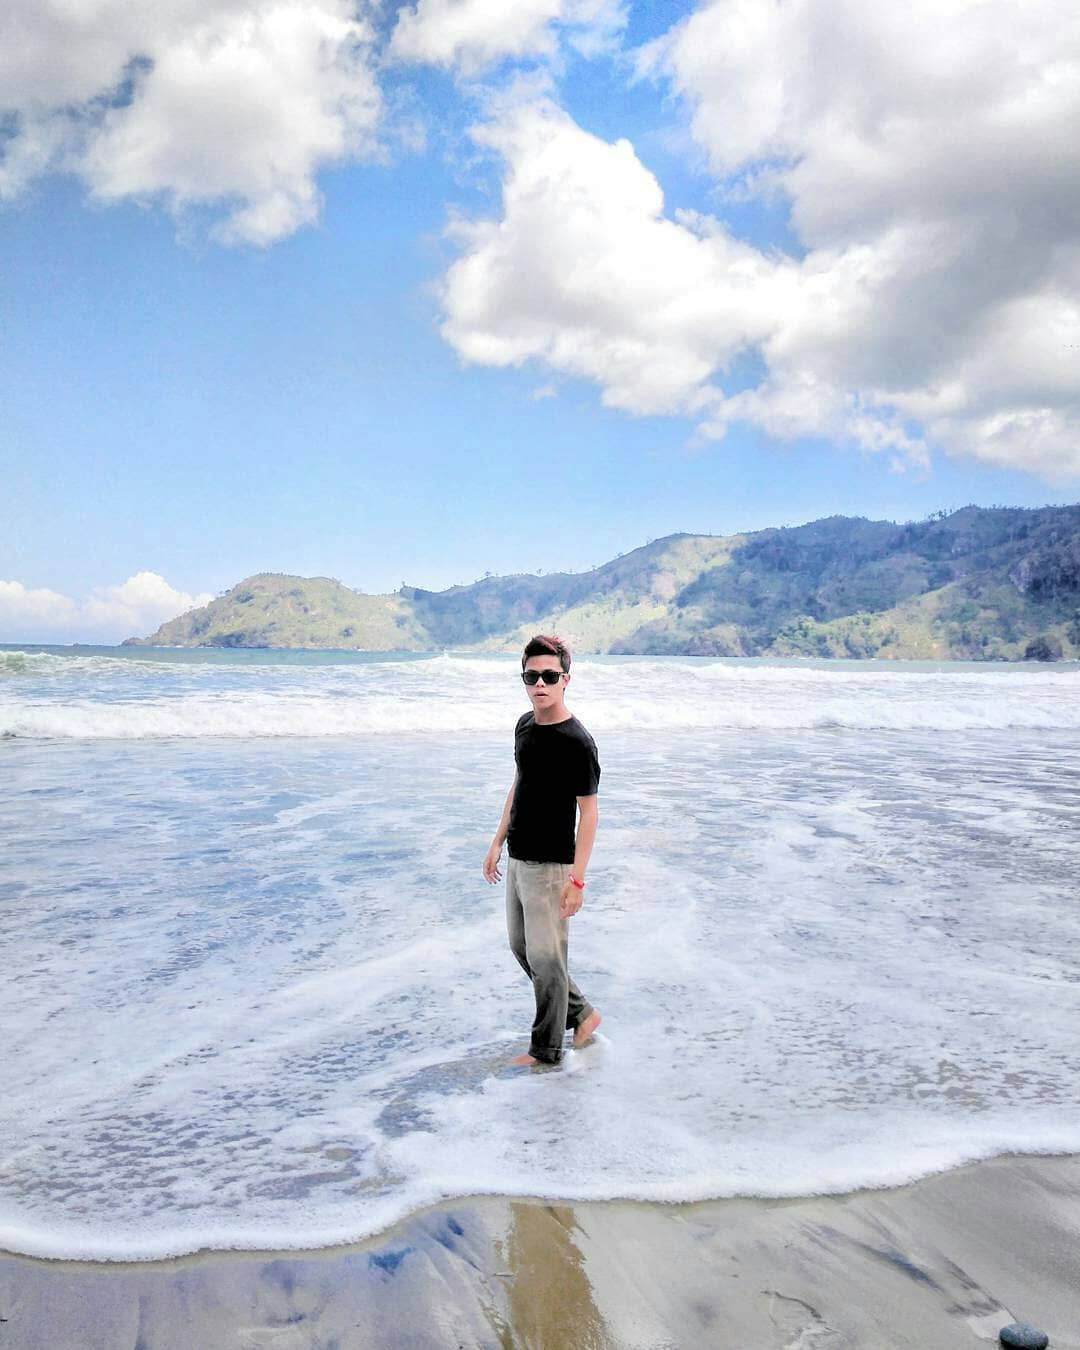 Pantai yang Sanggup Jadi Spot Selfie Super Kece, Malang, Kabupaten Malang, Dolan Dolen, Dolaners Pantai yang Sanggup Jadi Spot Selfie Super Kece by feryrinaldy - Dolan Dolen